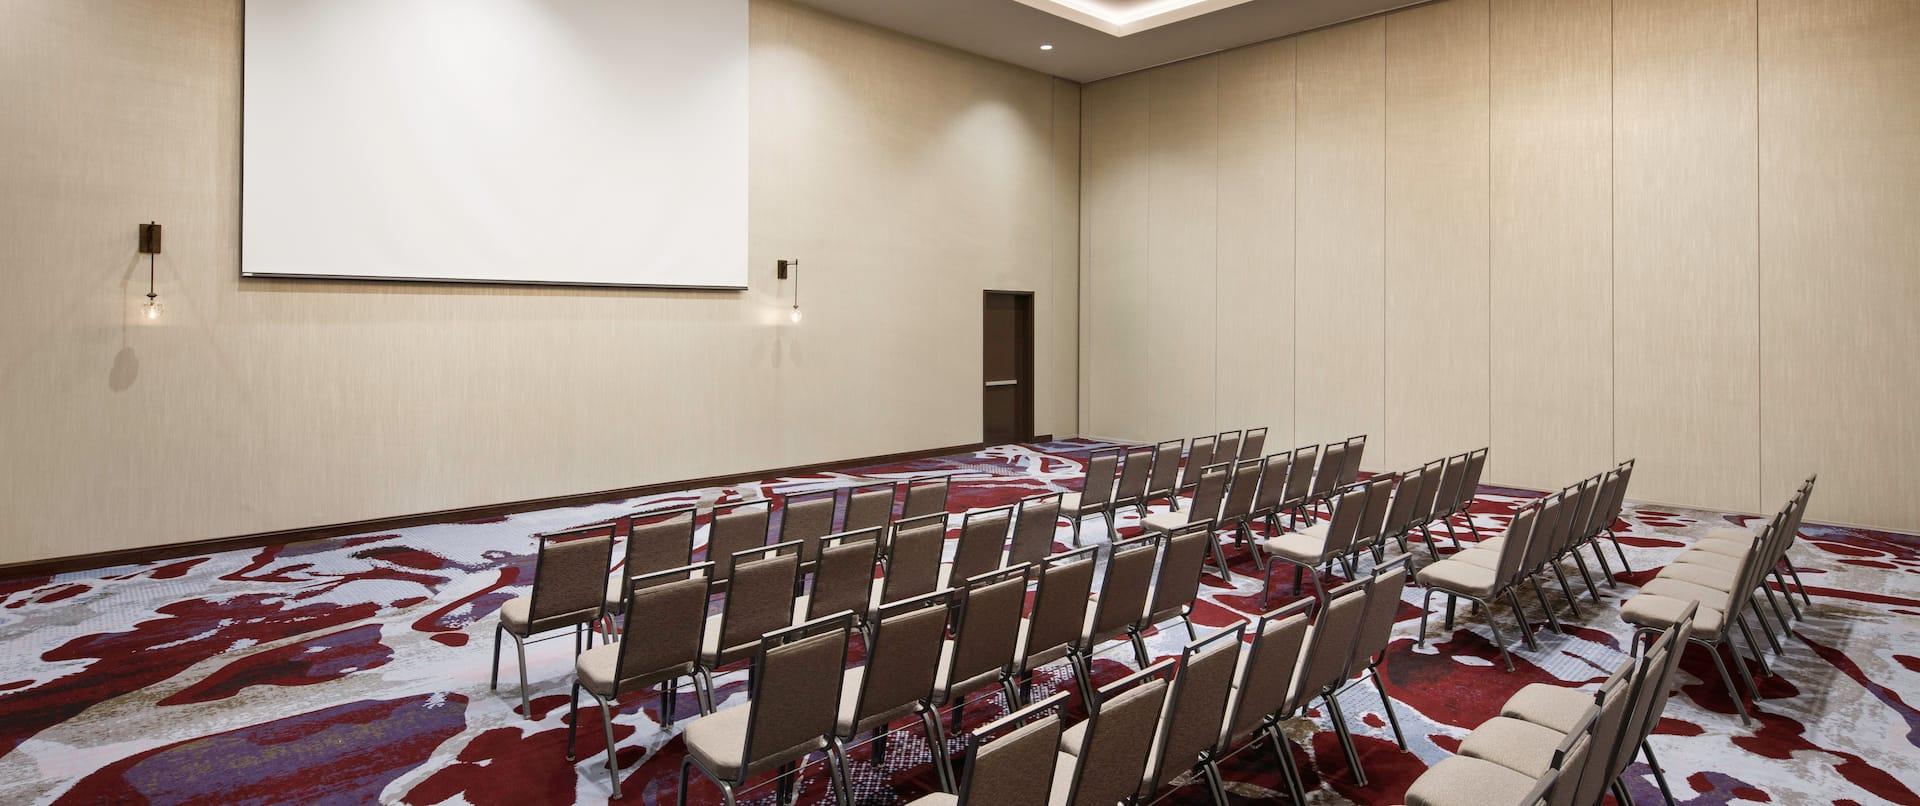 Ballroom Classroom  Setup with Projector Screen